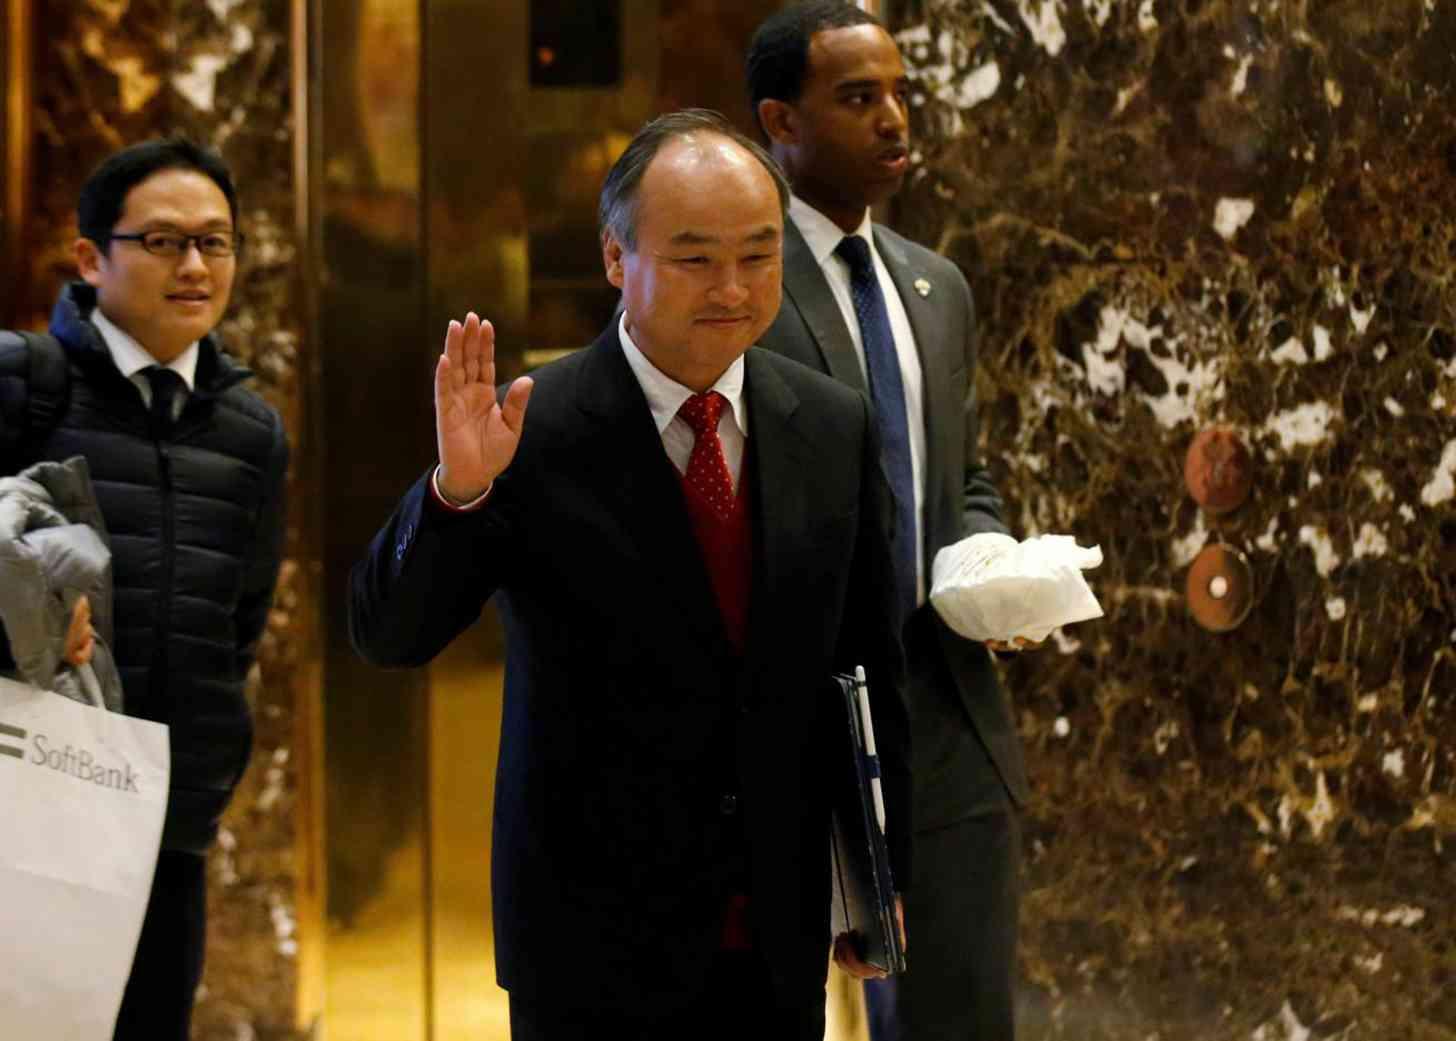 SoftBank CEO Masayoshi Son